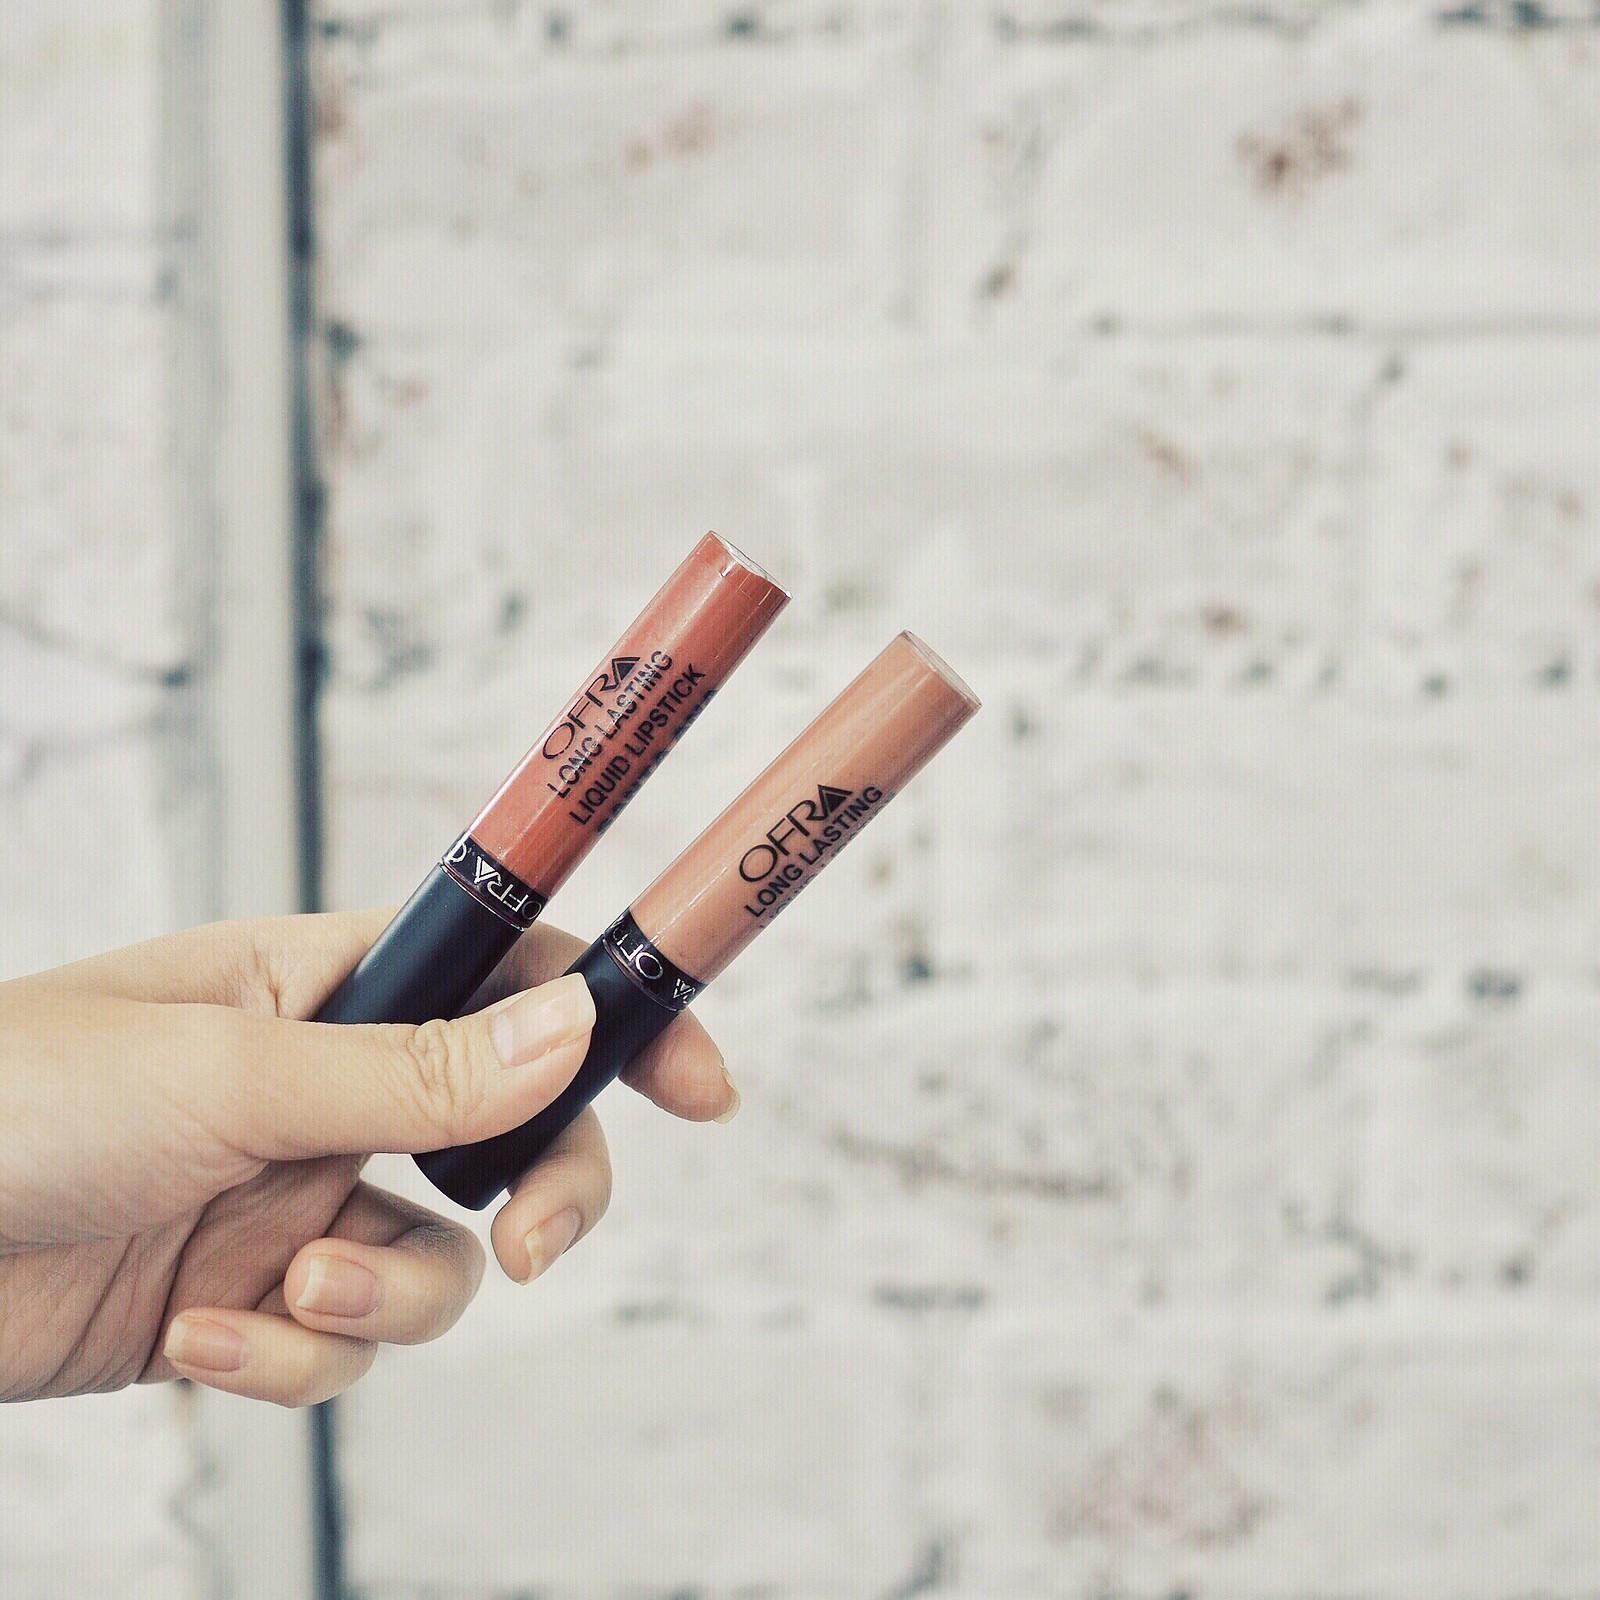 ofra-long-lasting-liquid-lipstick